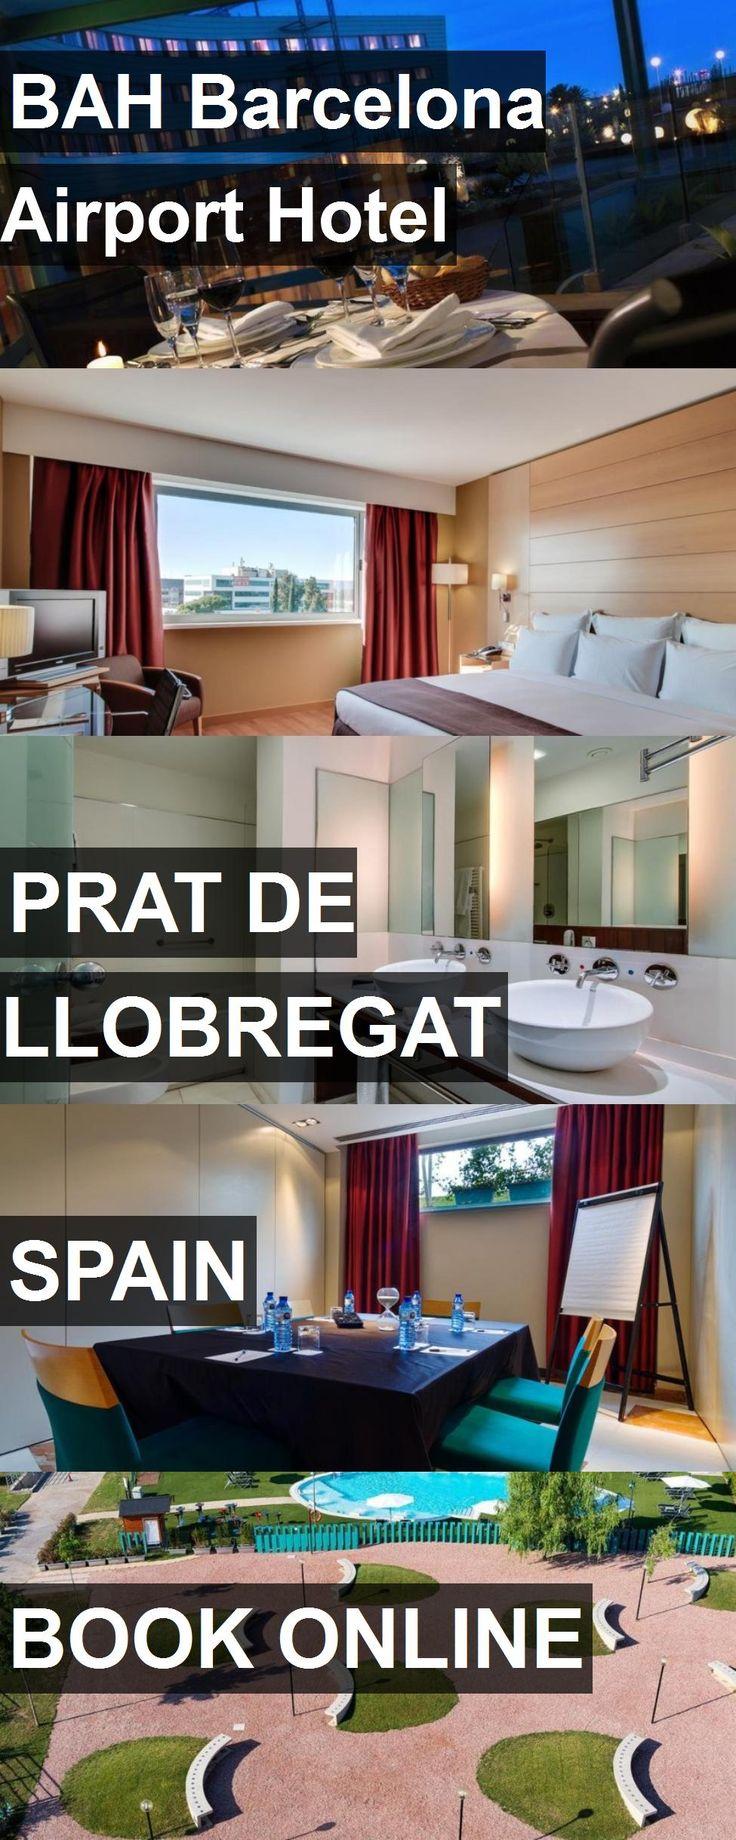 BAH Barcelona Airport Hotel in Prat de Llobregat, Spain. For more information, photos, reviews and best prices please follow the link. #Spain #PratdeLlobregat #travel #vacation #hotel